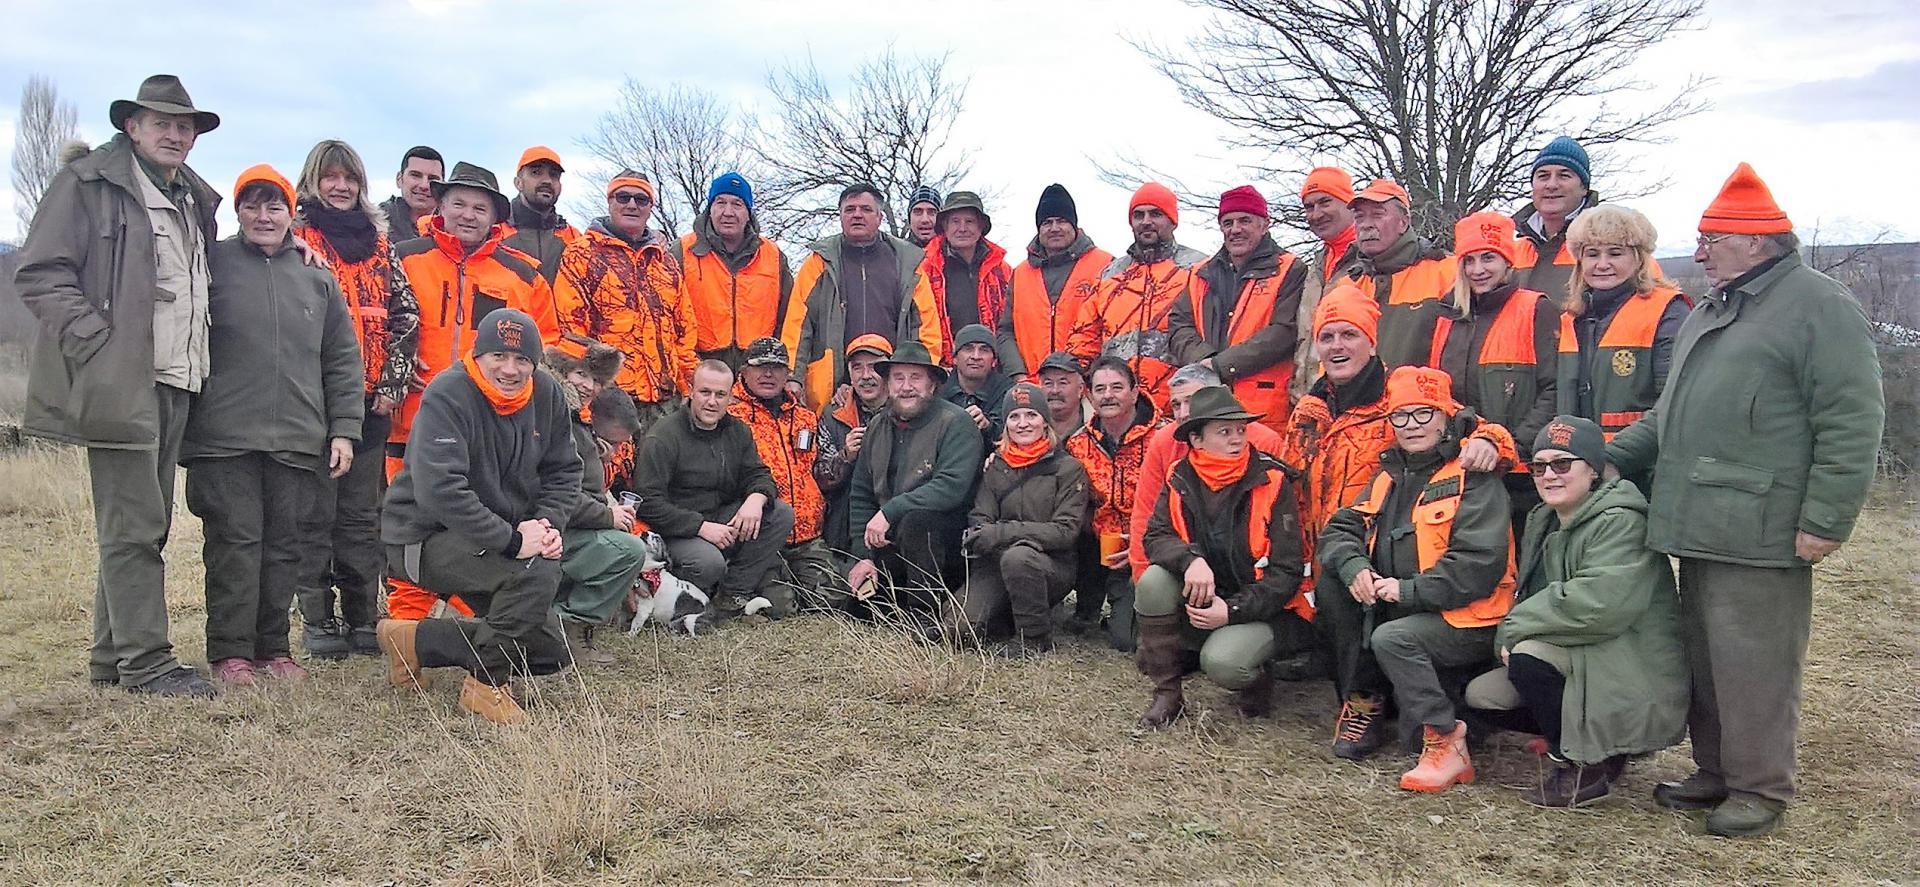 Bili smo u akciji s lovkinjama na terenima kod Ervenika: dame praše k'o momci, samo kobasice ne vade…